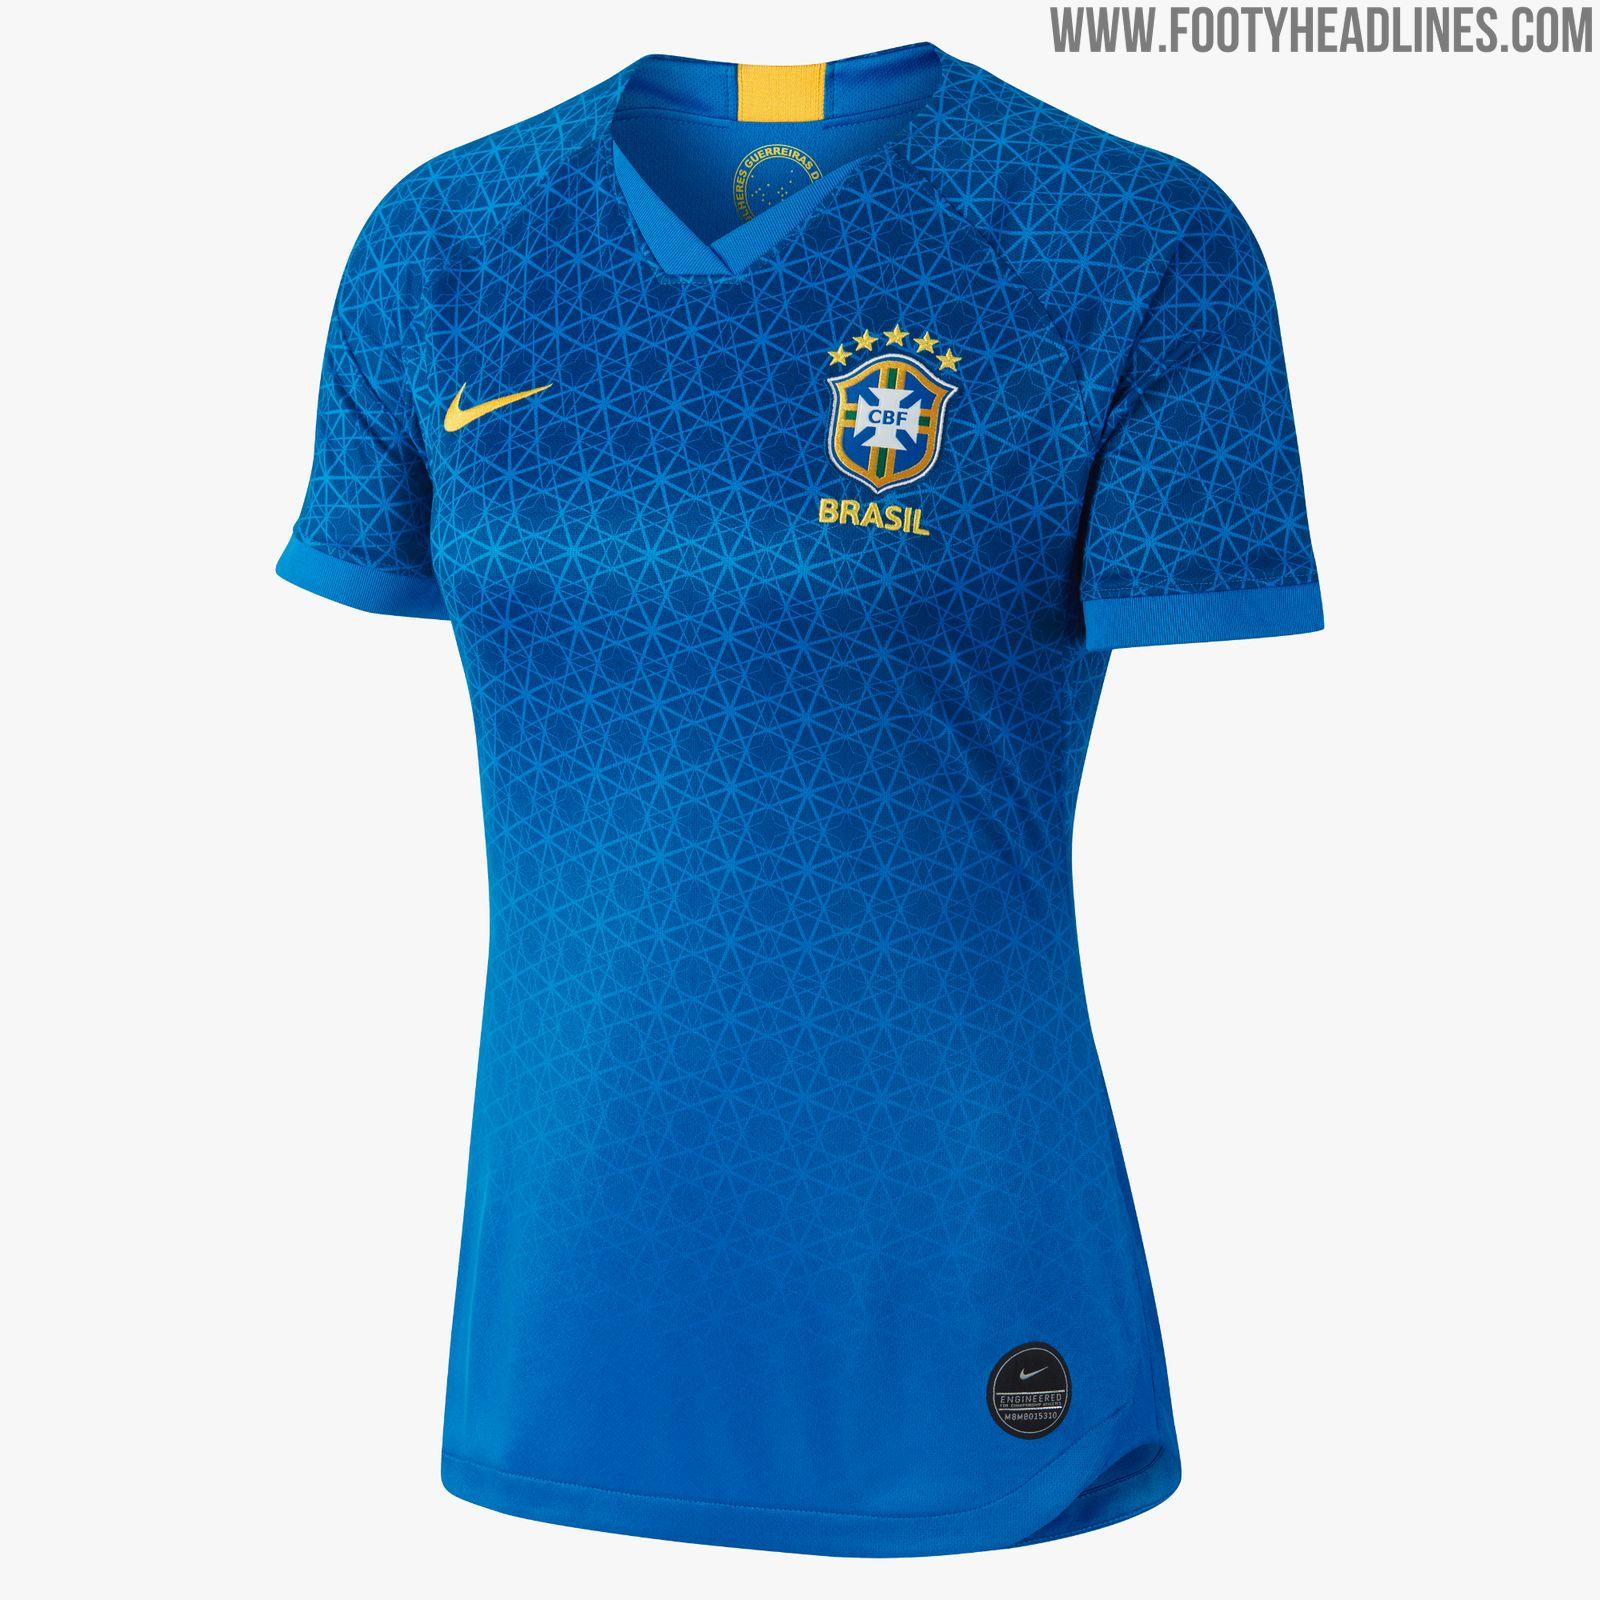 Brasilien frauen treffen